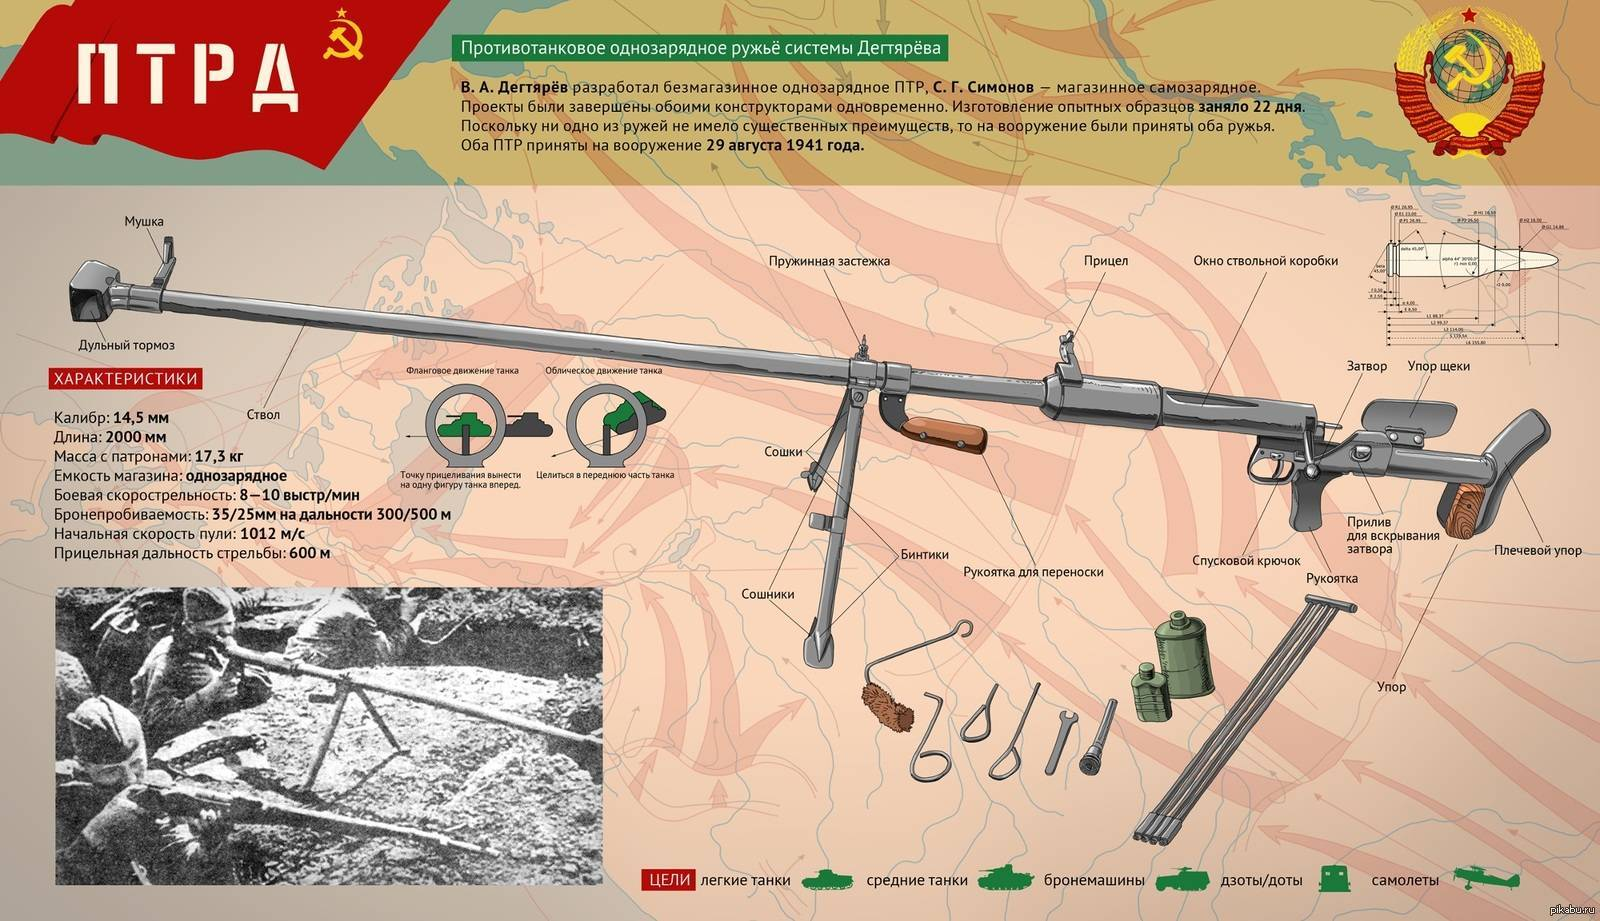 Противотанковое ружьё симонова (птрс)